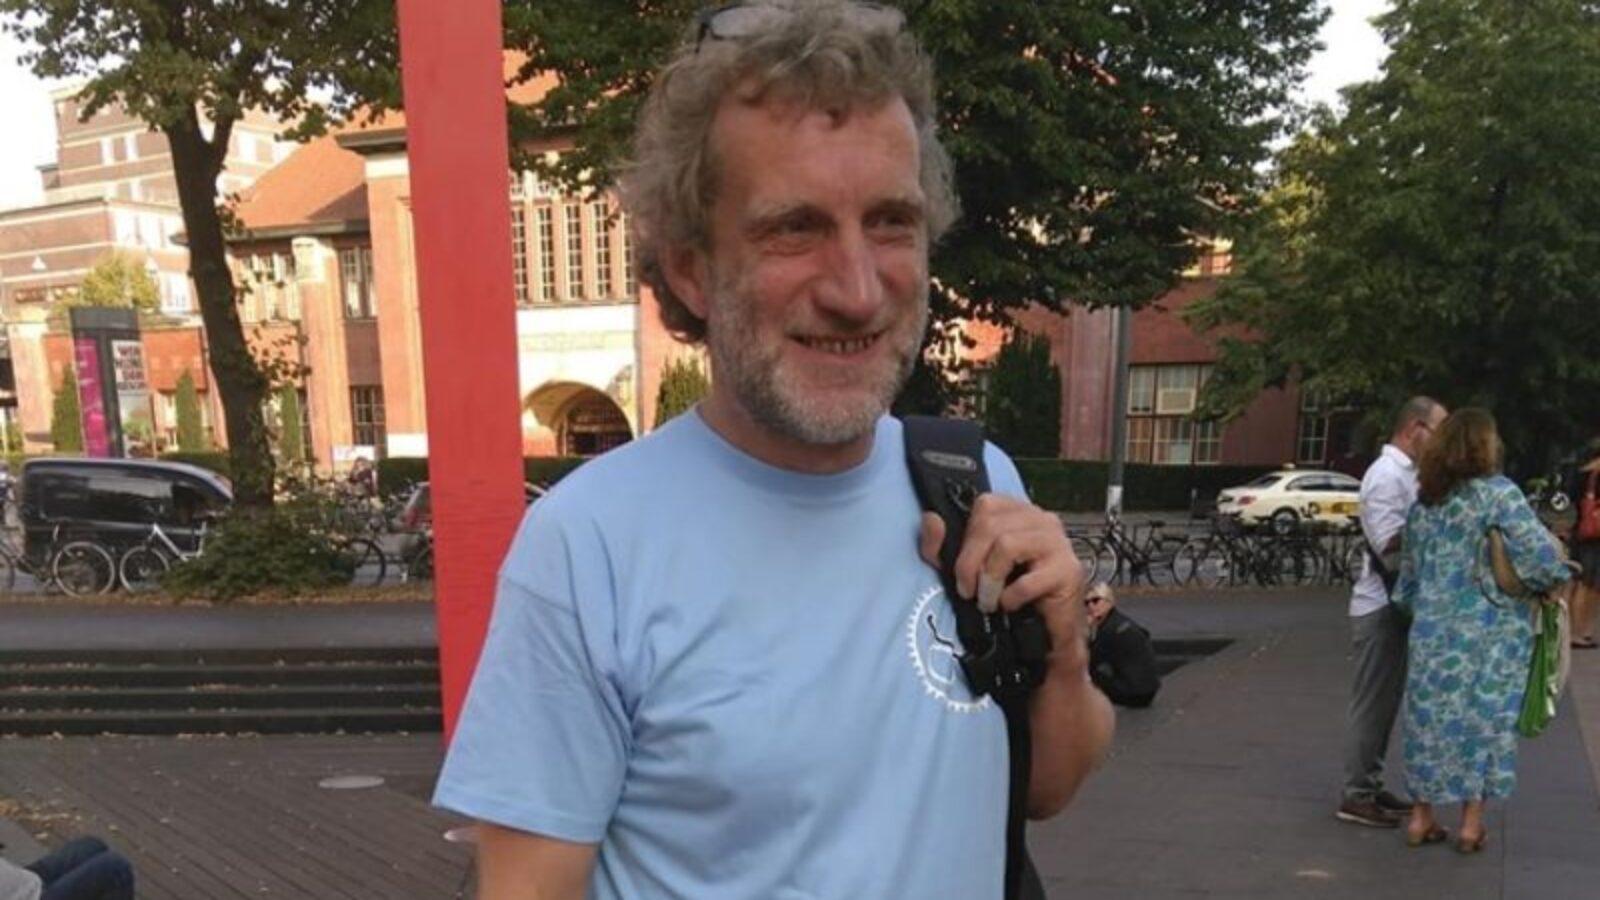 HAMBURGER DES MONATS: Christian Großeholz